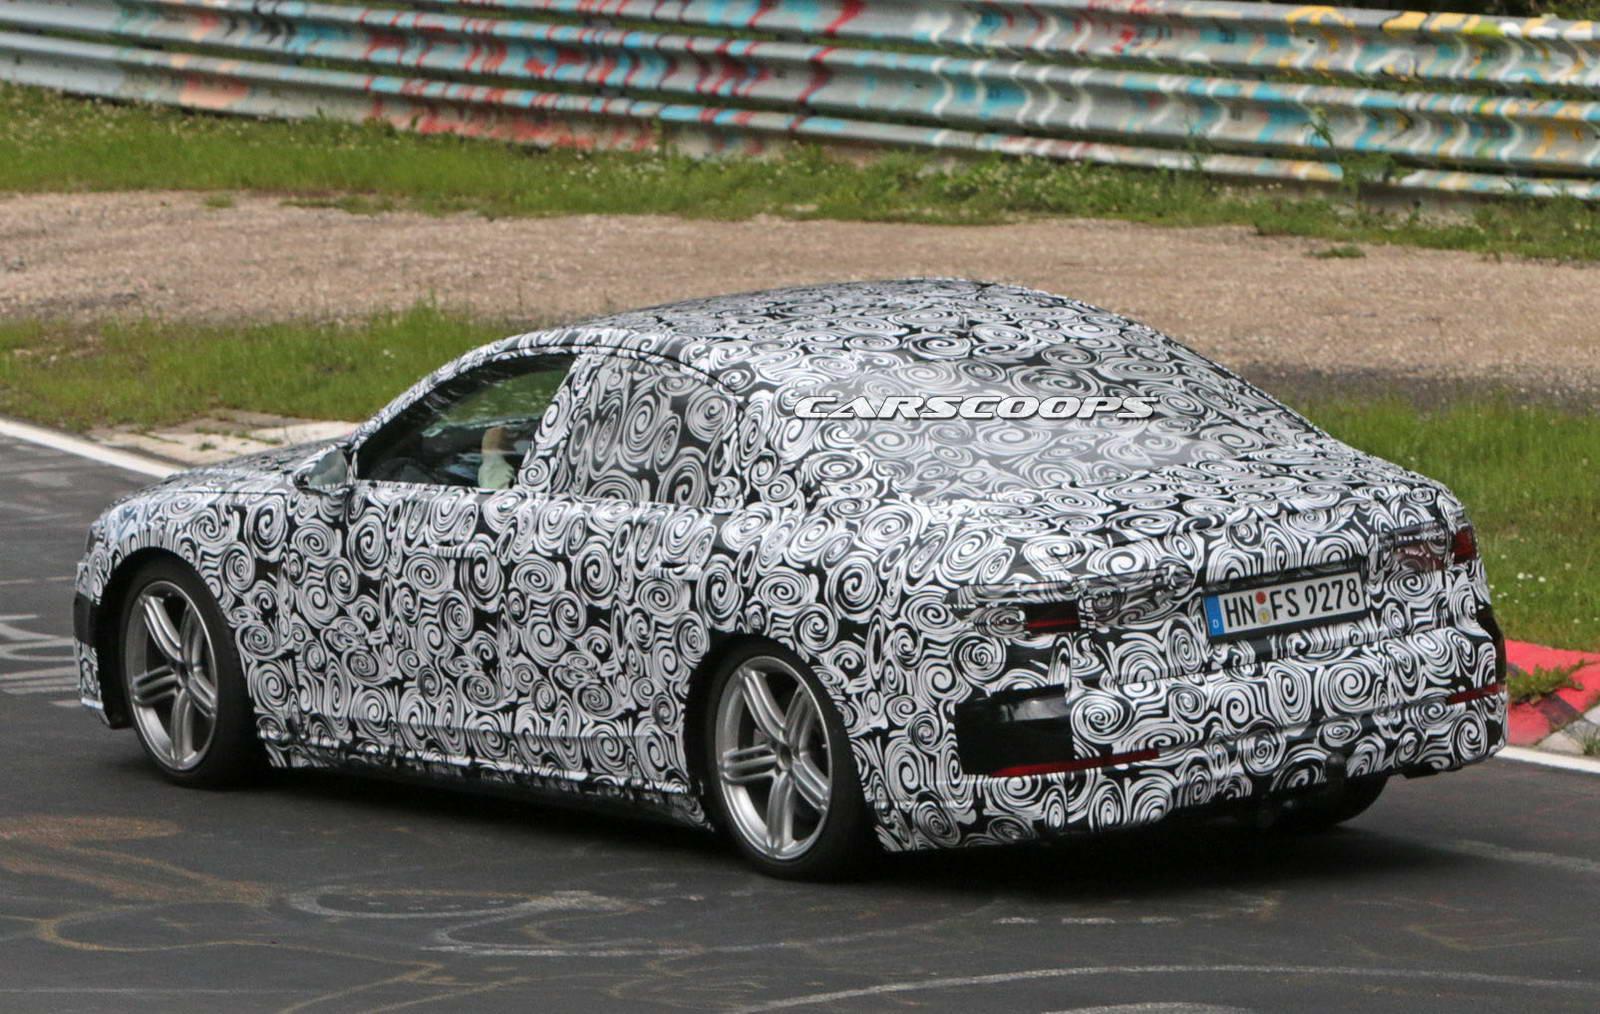 Categories Audi Audi A8 Audi Scoops Scoops